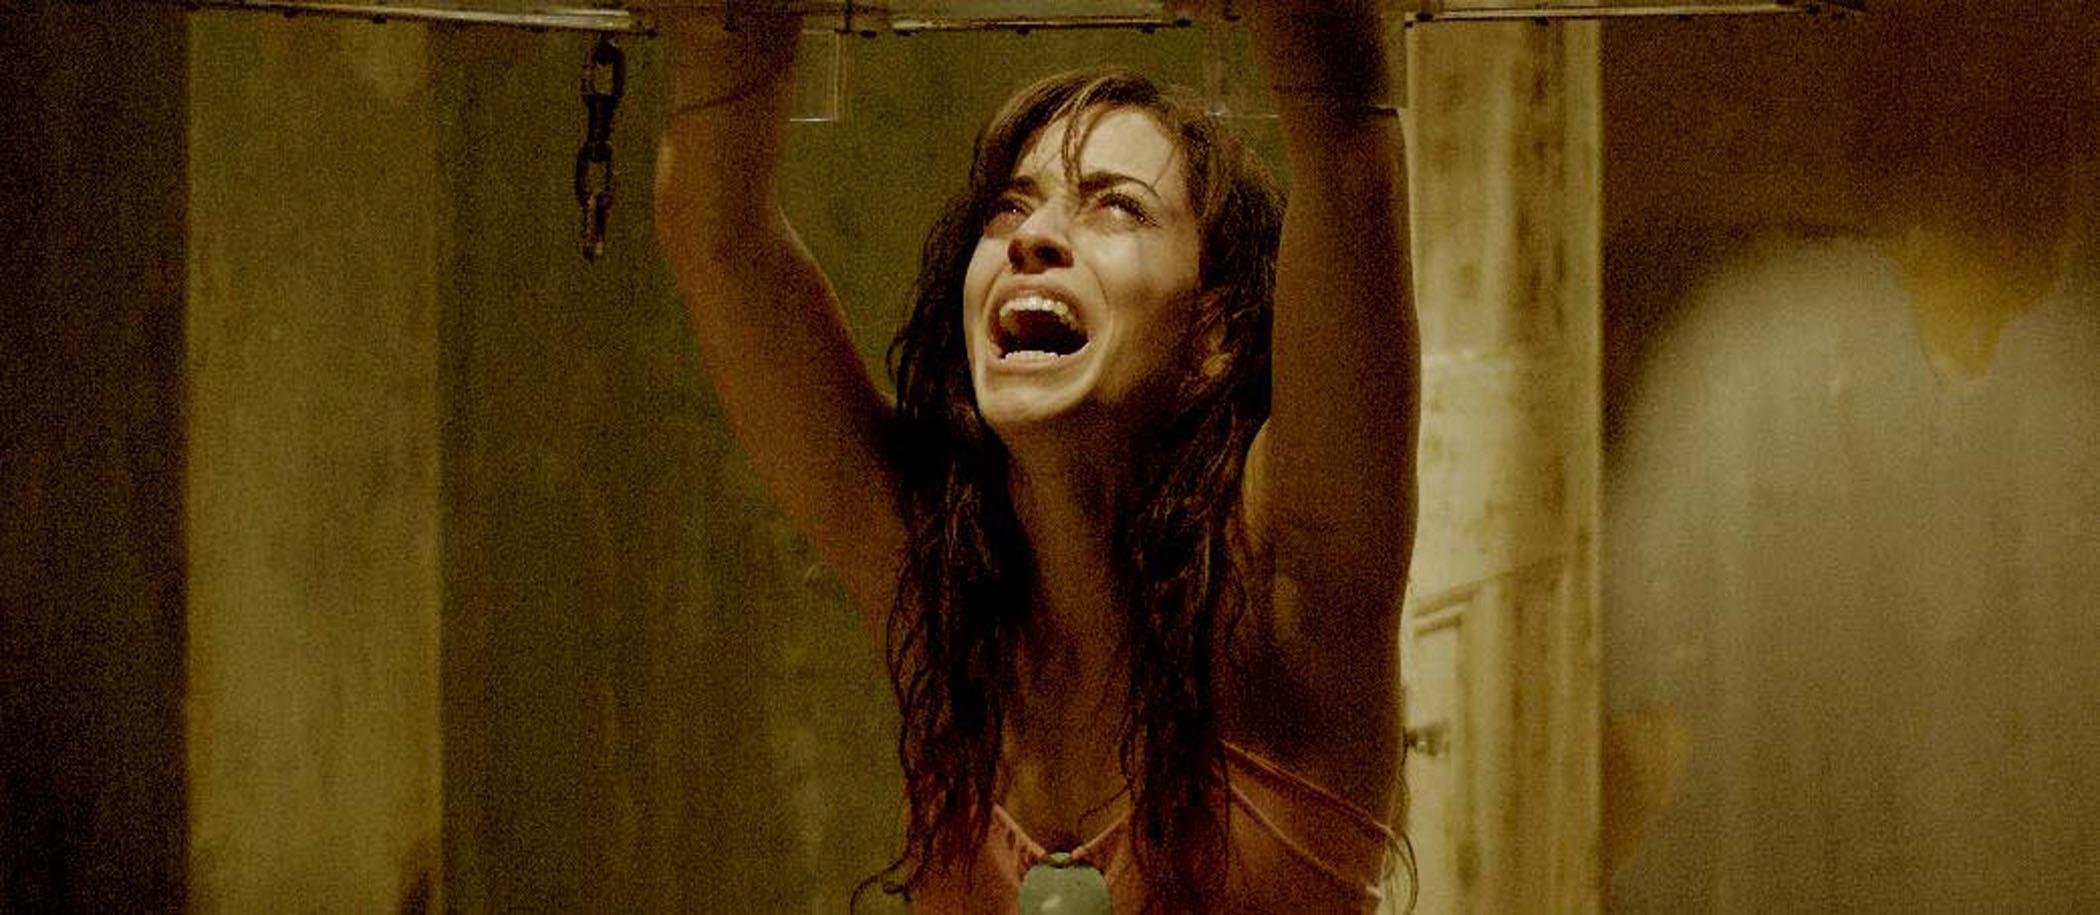 Saw III (Courtesy of Lionsgate)